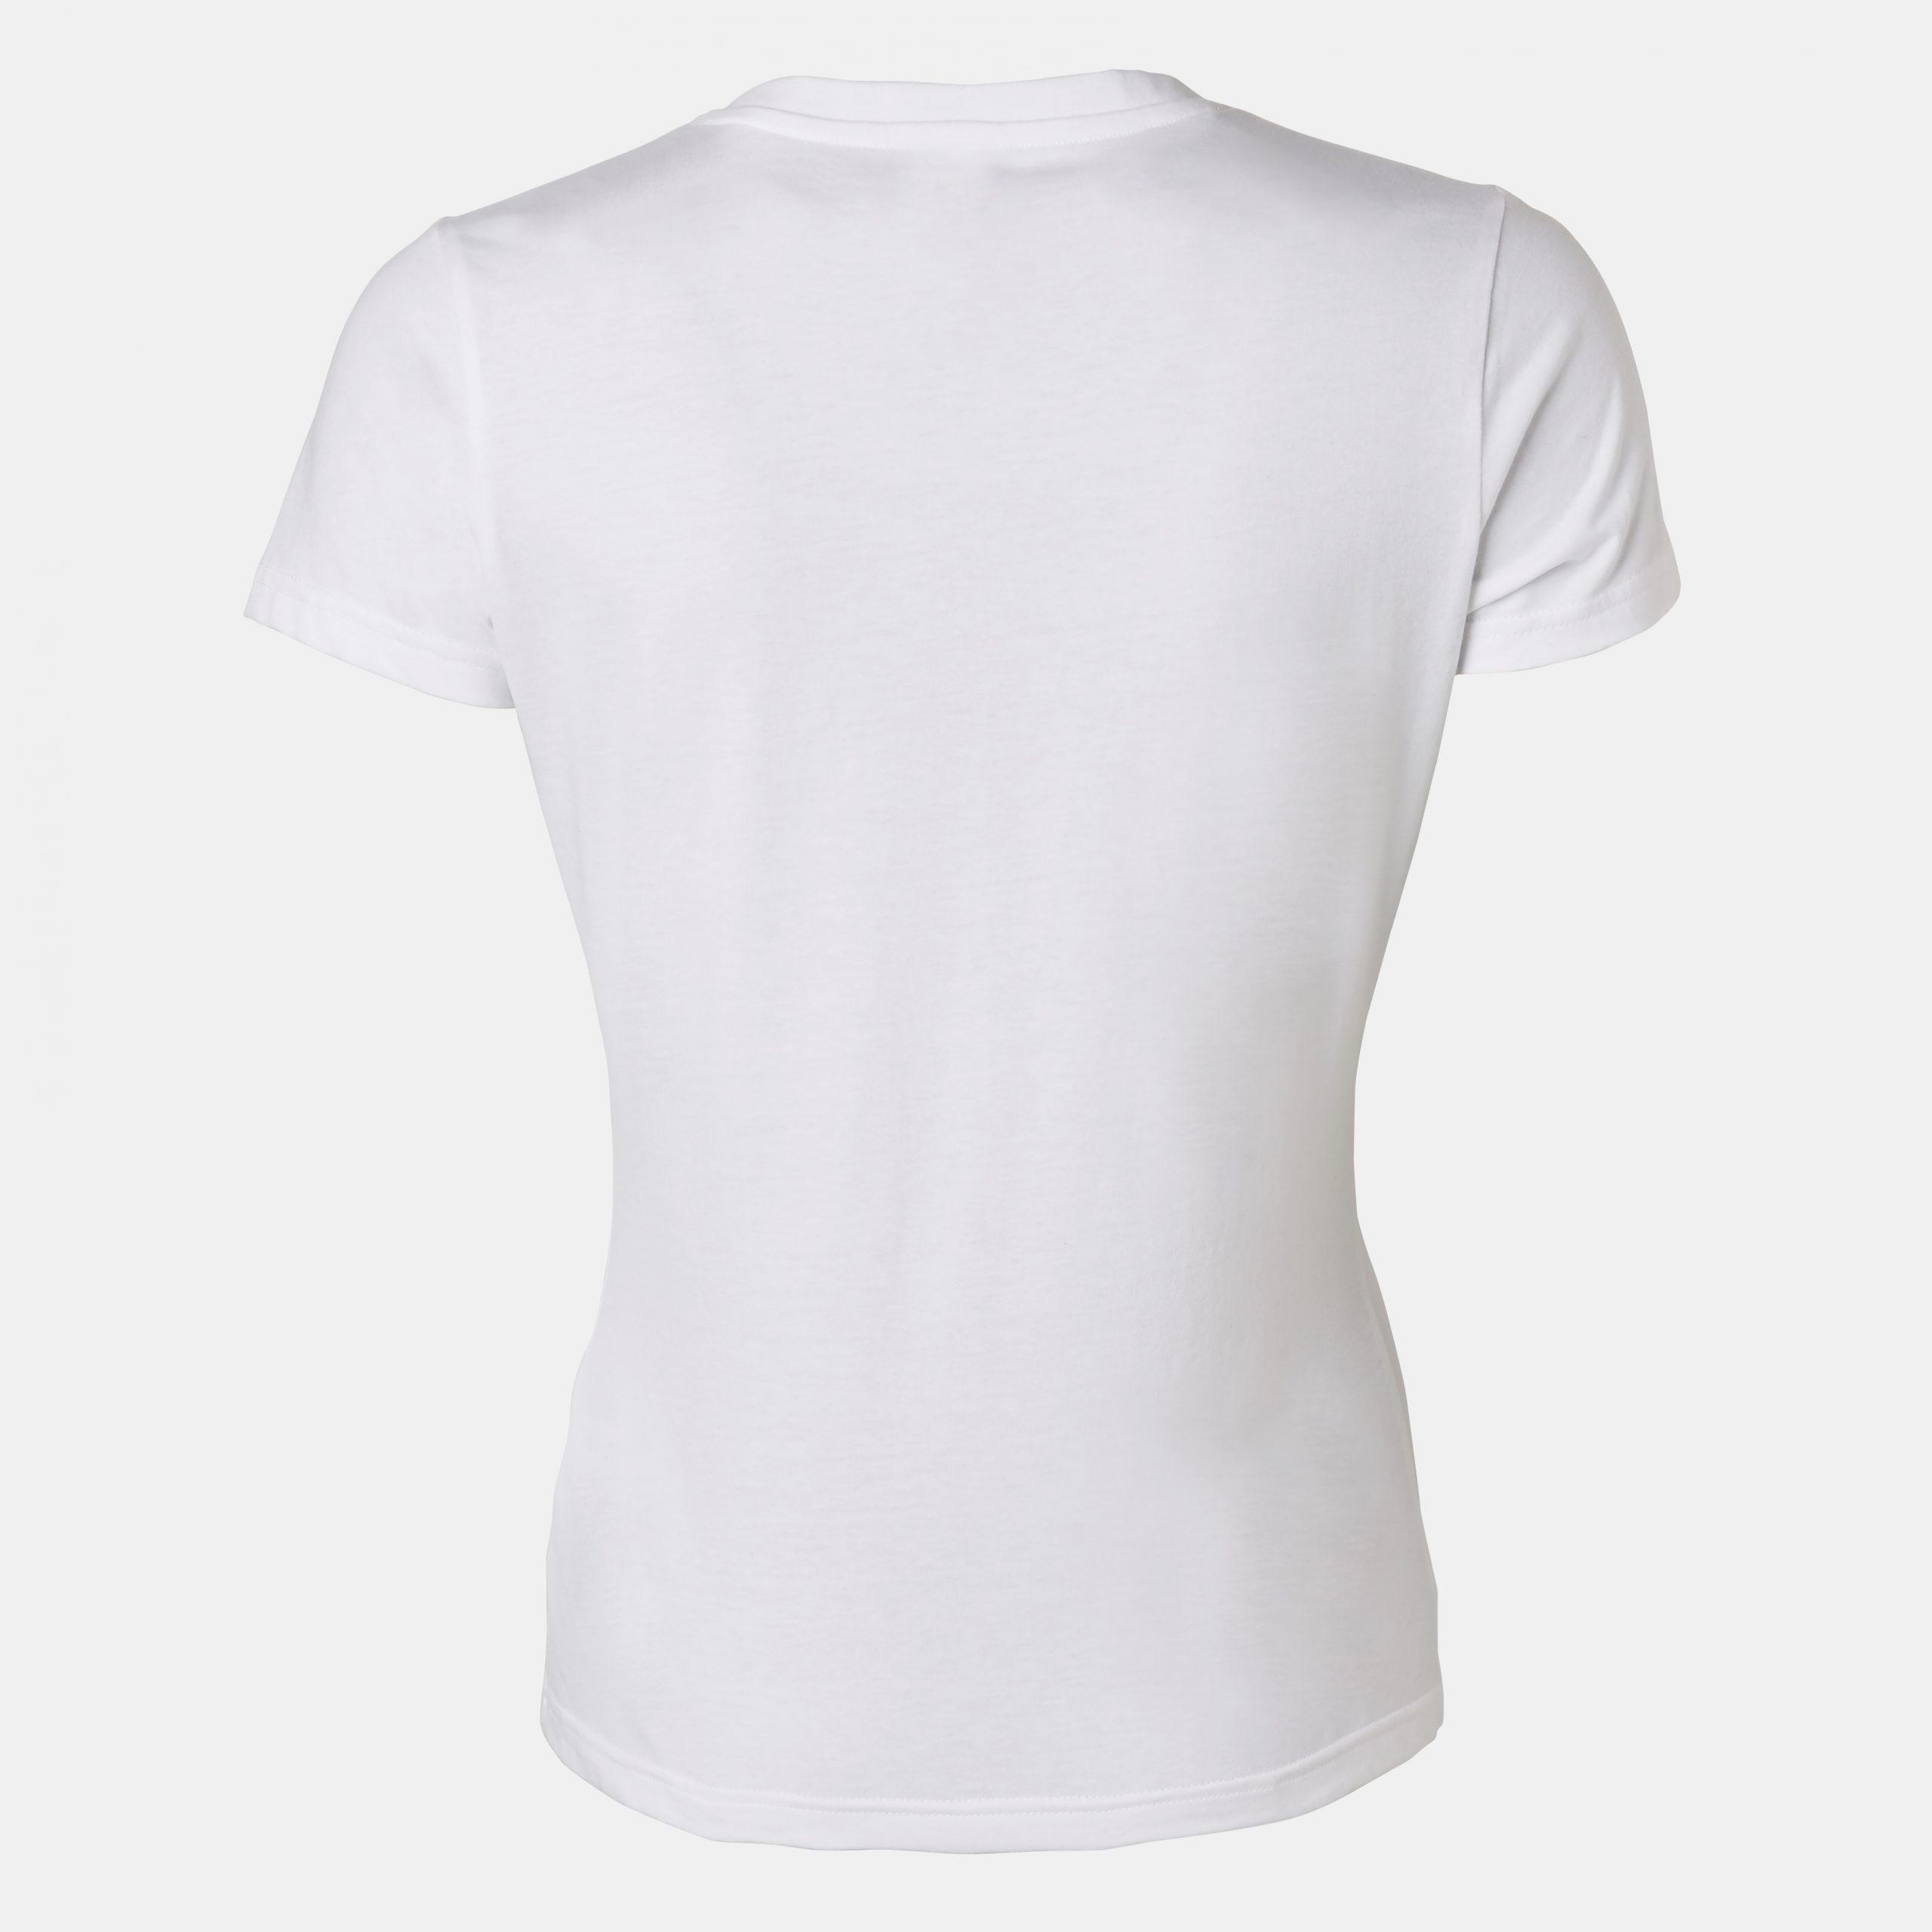 VMC112639210M T-shirt-damska-biała